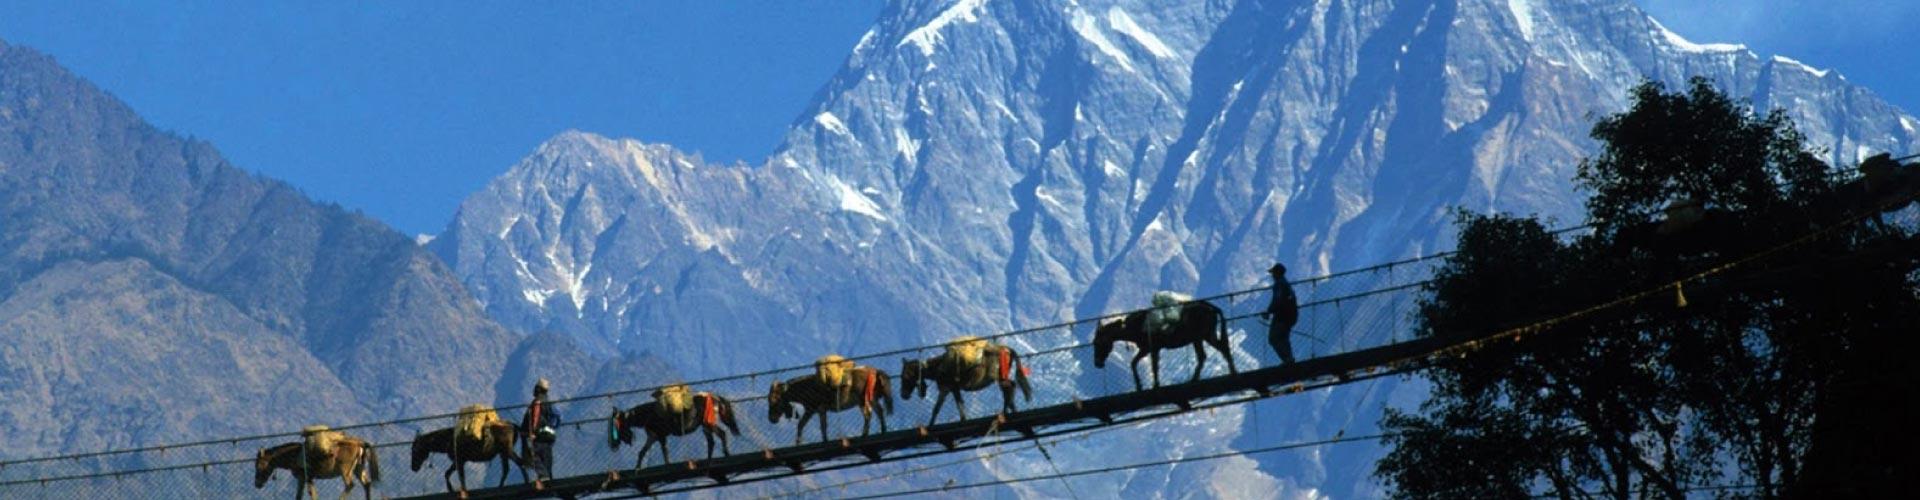 Experience Nepal Tour - Trekking